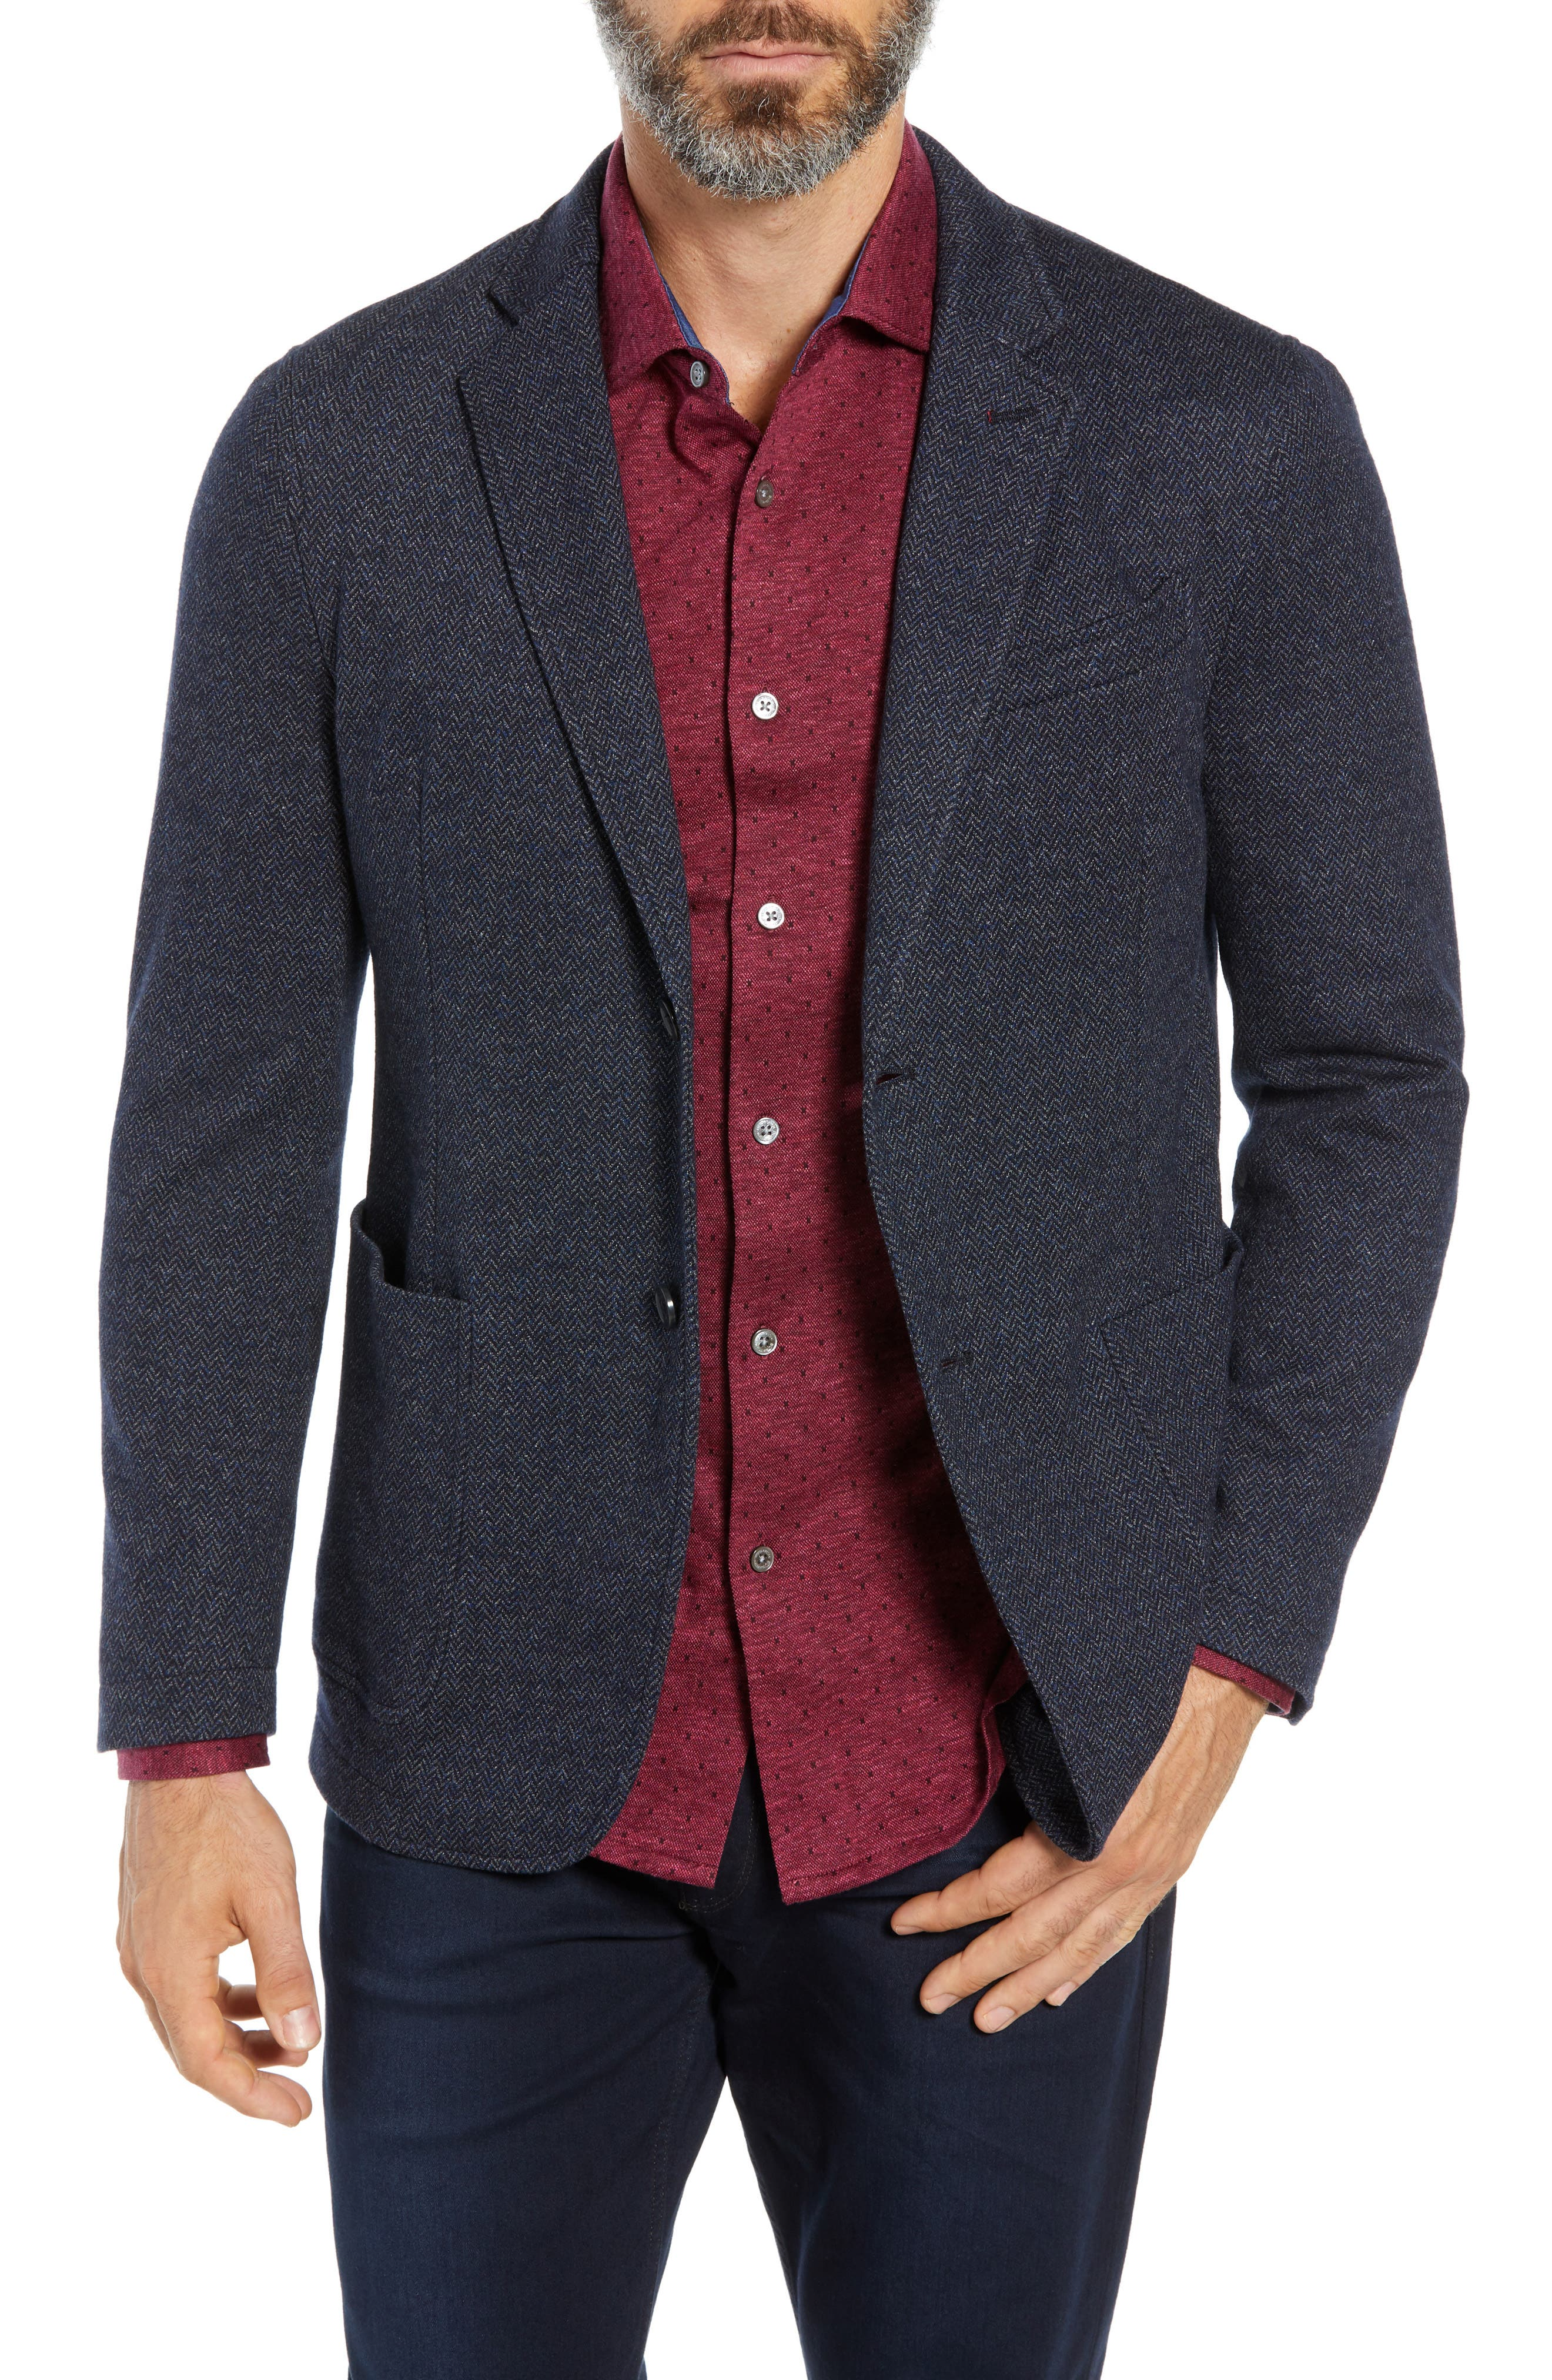 BUGATCHI Cotton & Wool Sport Coat in Night Blue